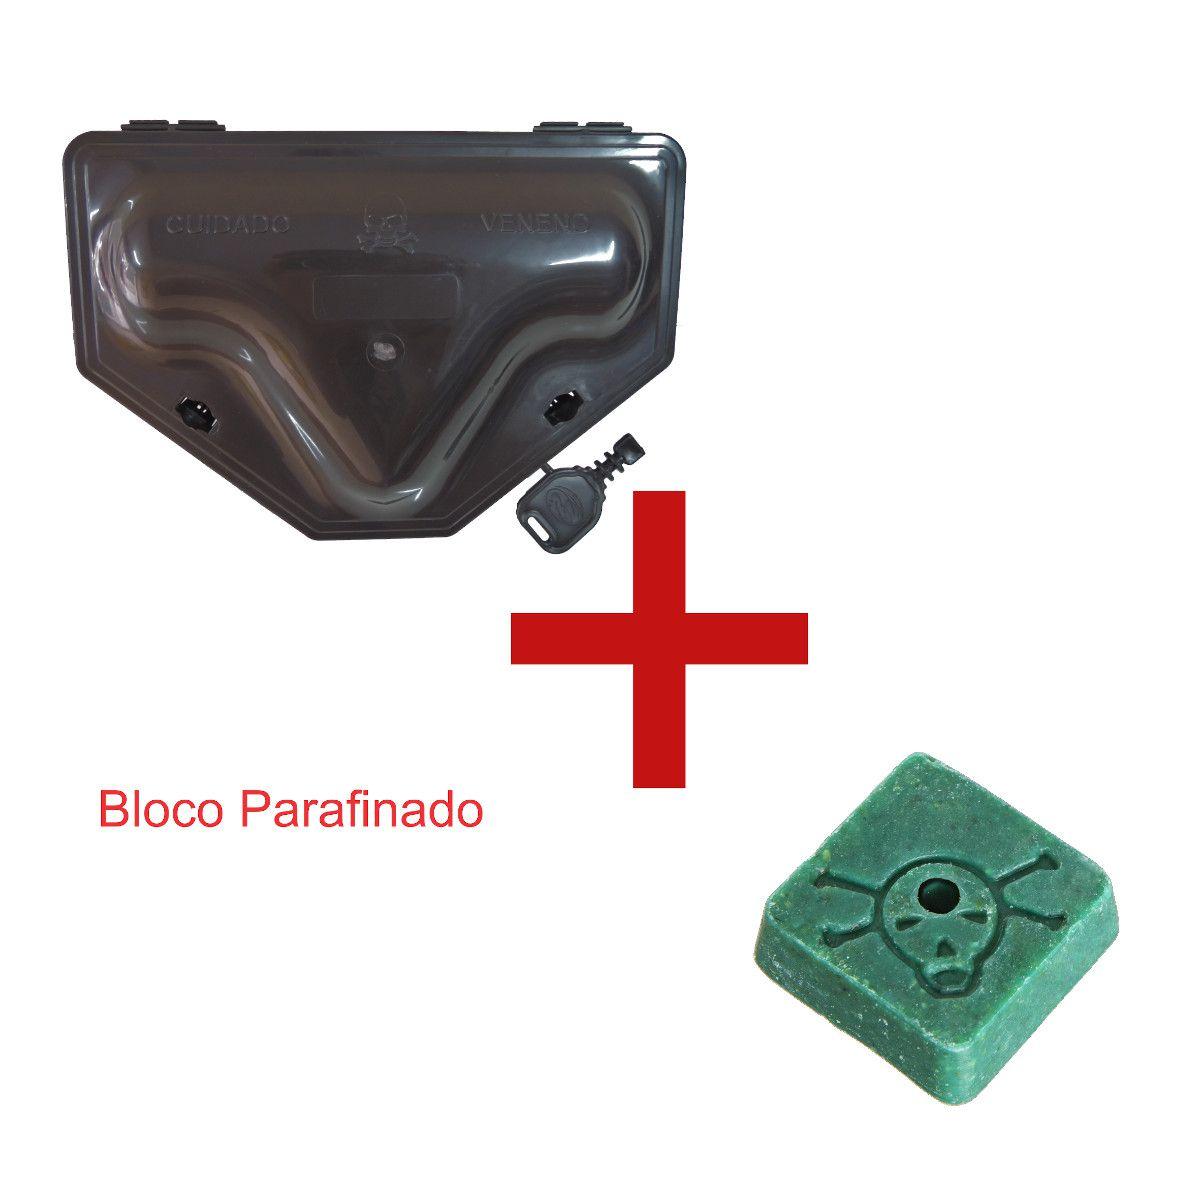 KIT 6 Porta Iscas Reforçado 2 TRAVAS Chave Ratoeira p/ ratos